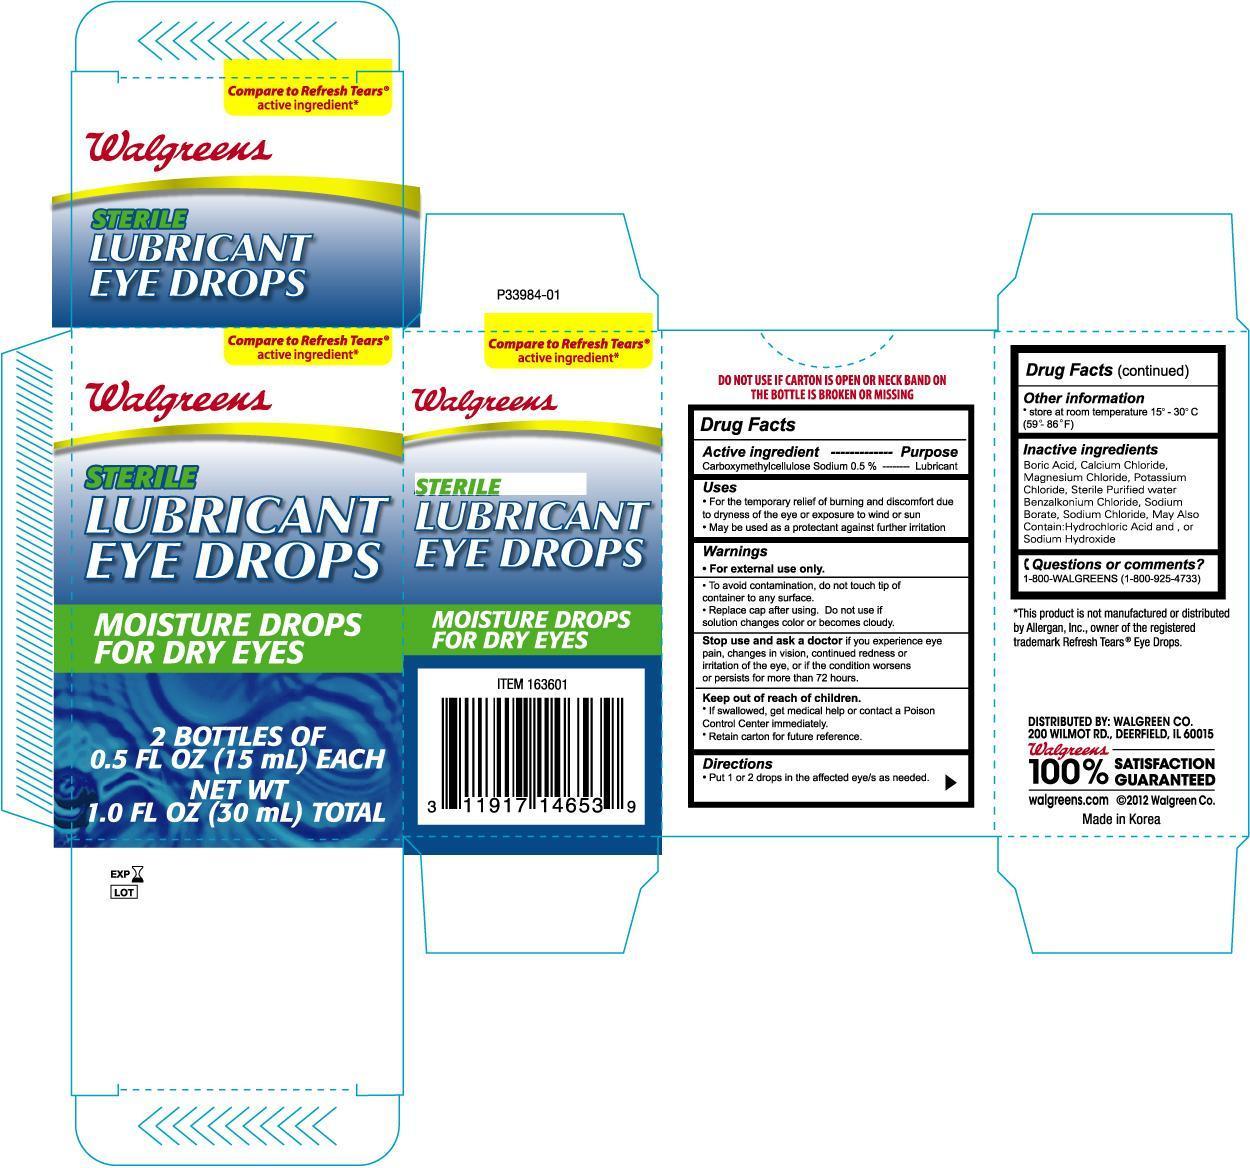 Walgreens Lubricant Eye (Carboxymethylcellulose Sodium) Solution [Walgreen Company]